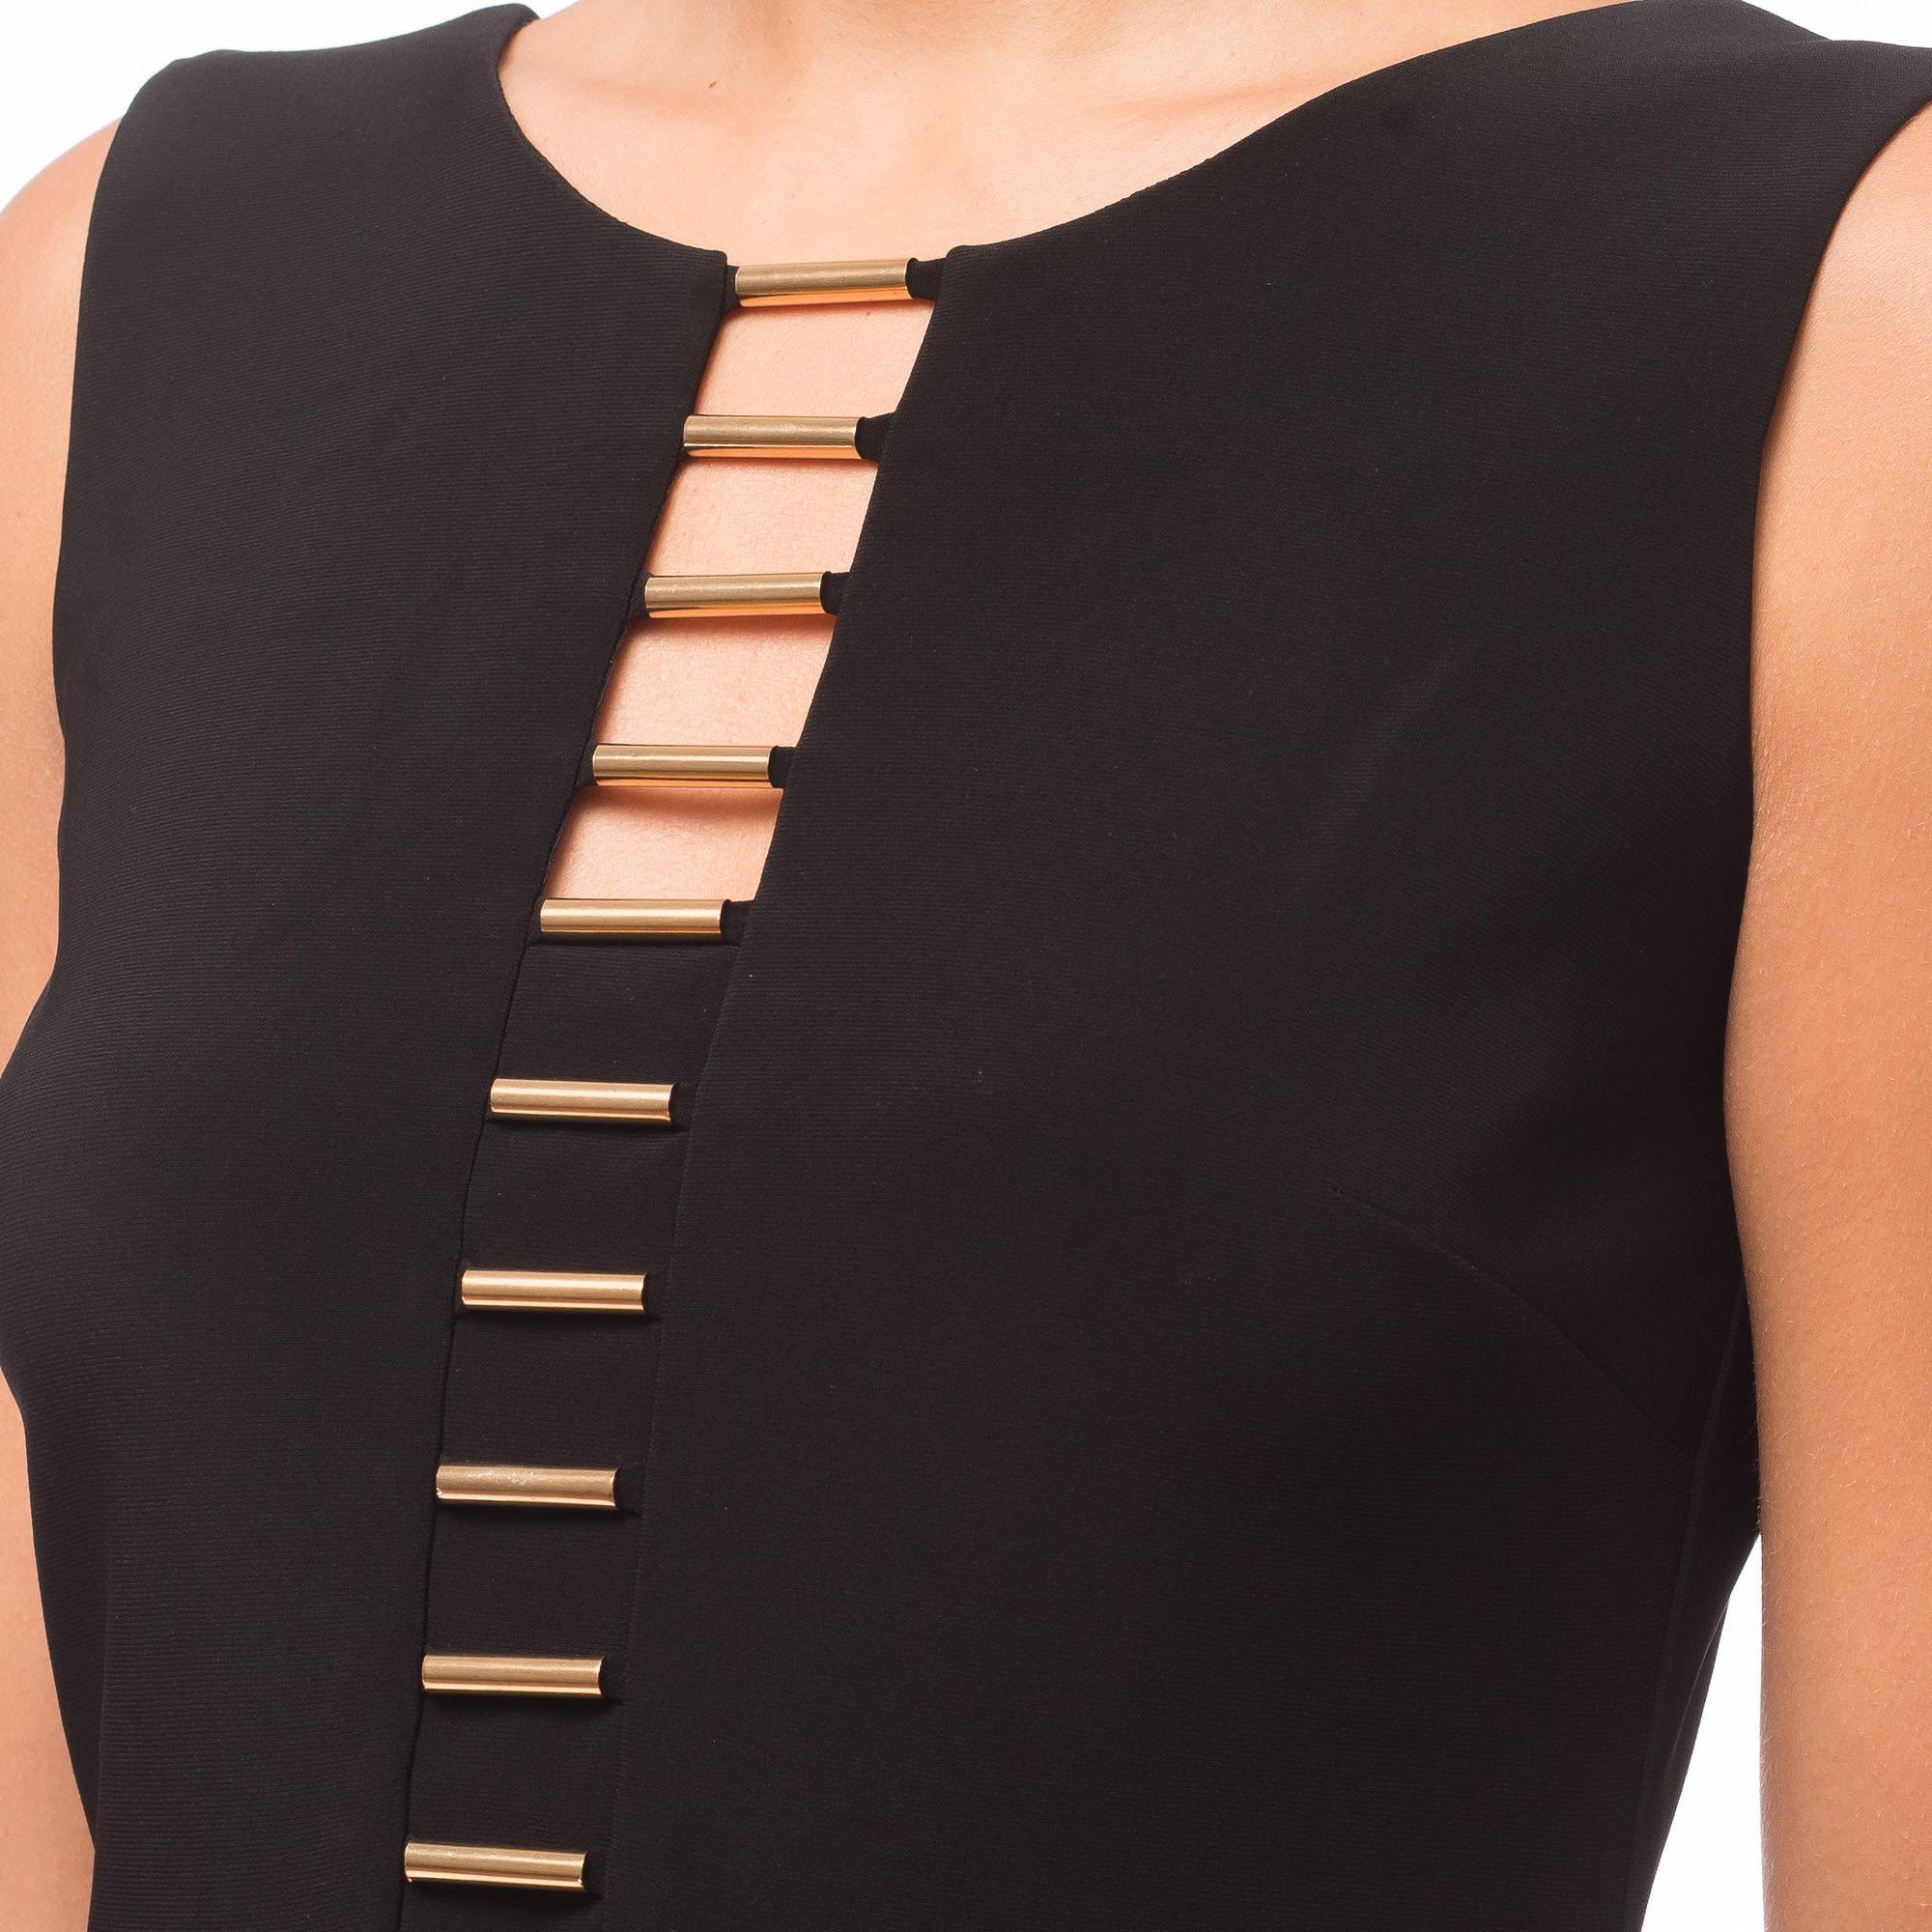 Joseph Ribkoff Goldtone Accent Sleeveless Black Sheath Dress Style 181035 Size 12